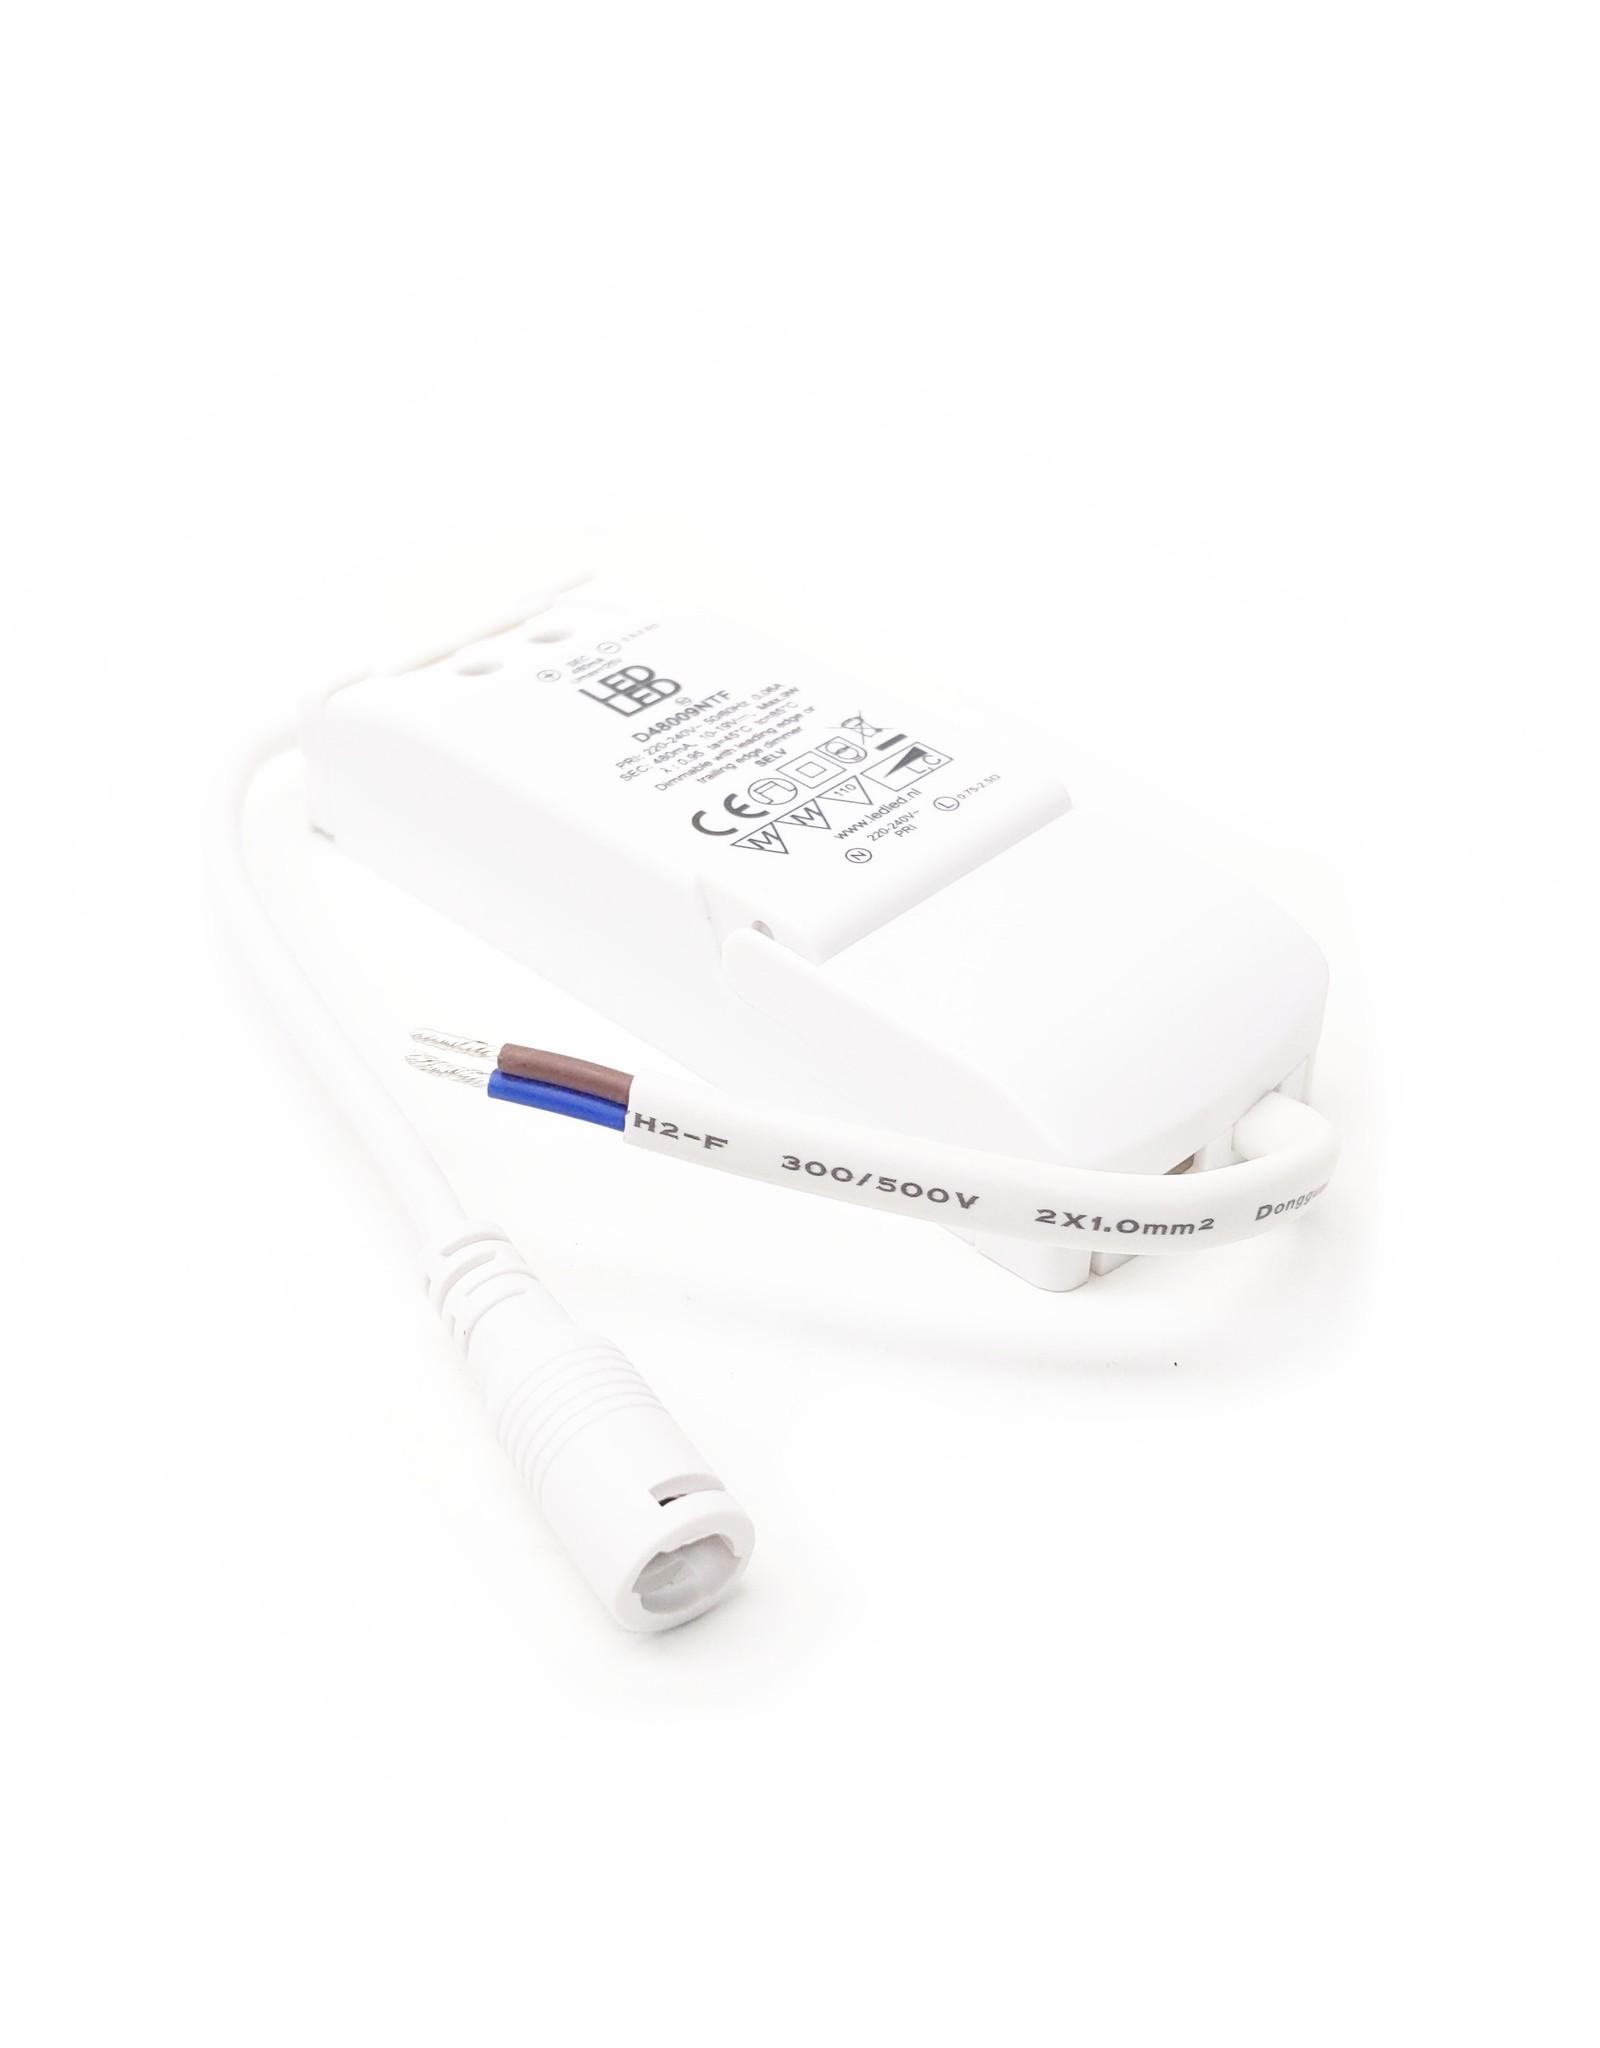 LedLed ADDY led kantelspot rond wit dimbaar - Pro reflector